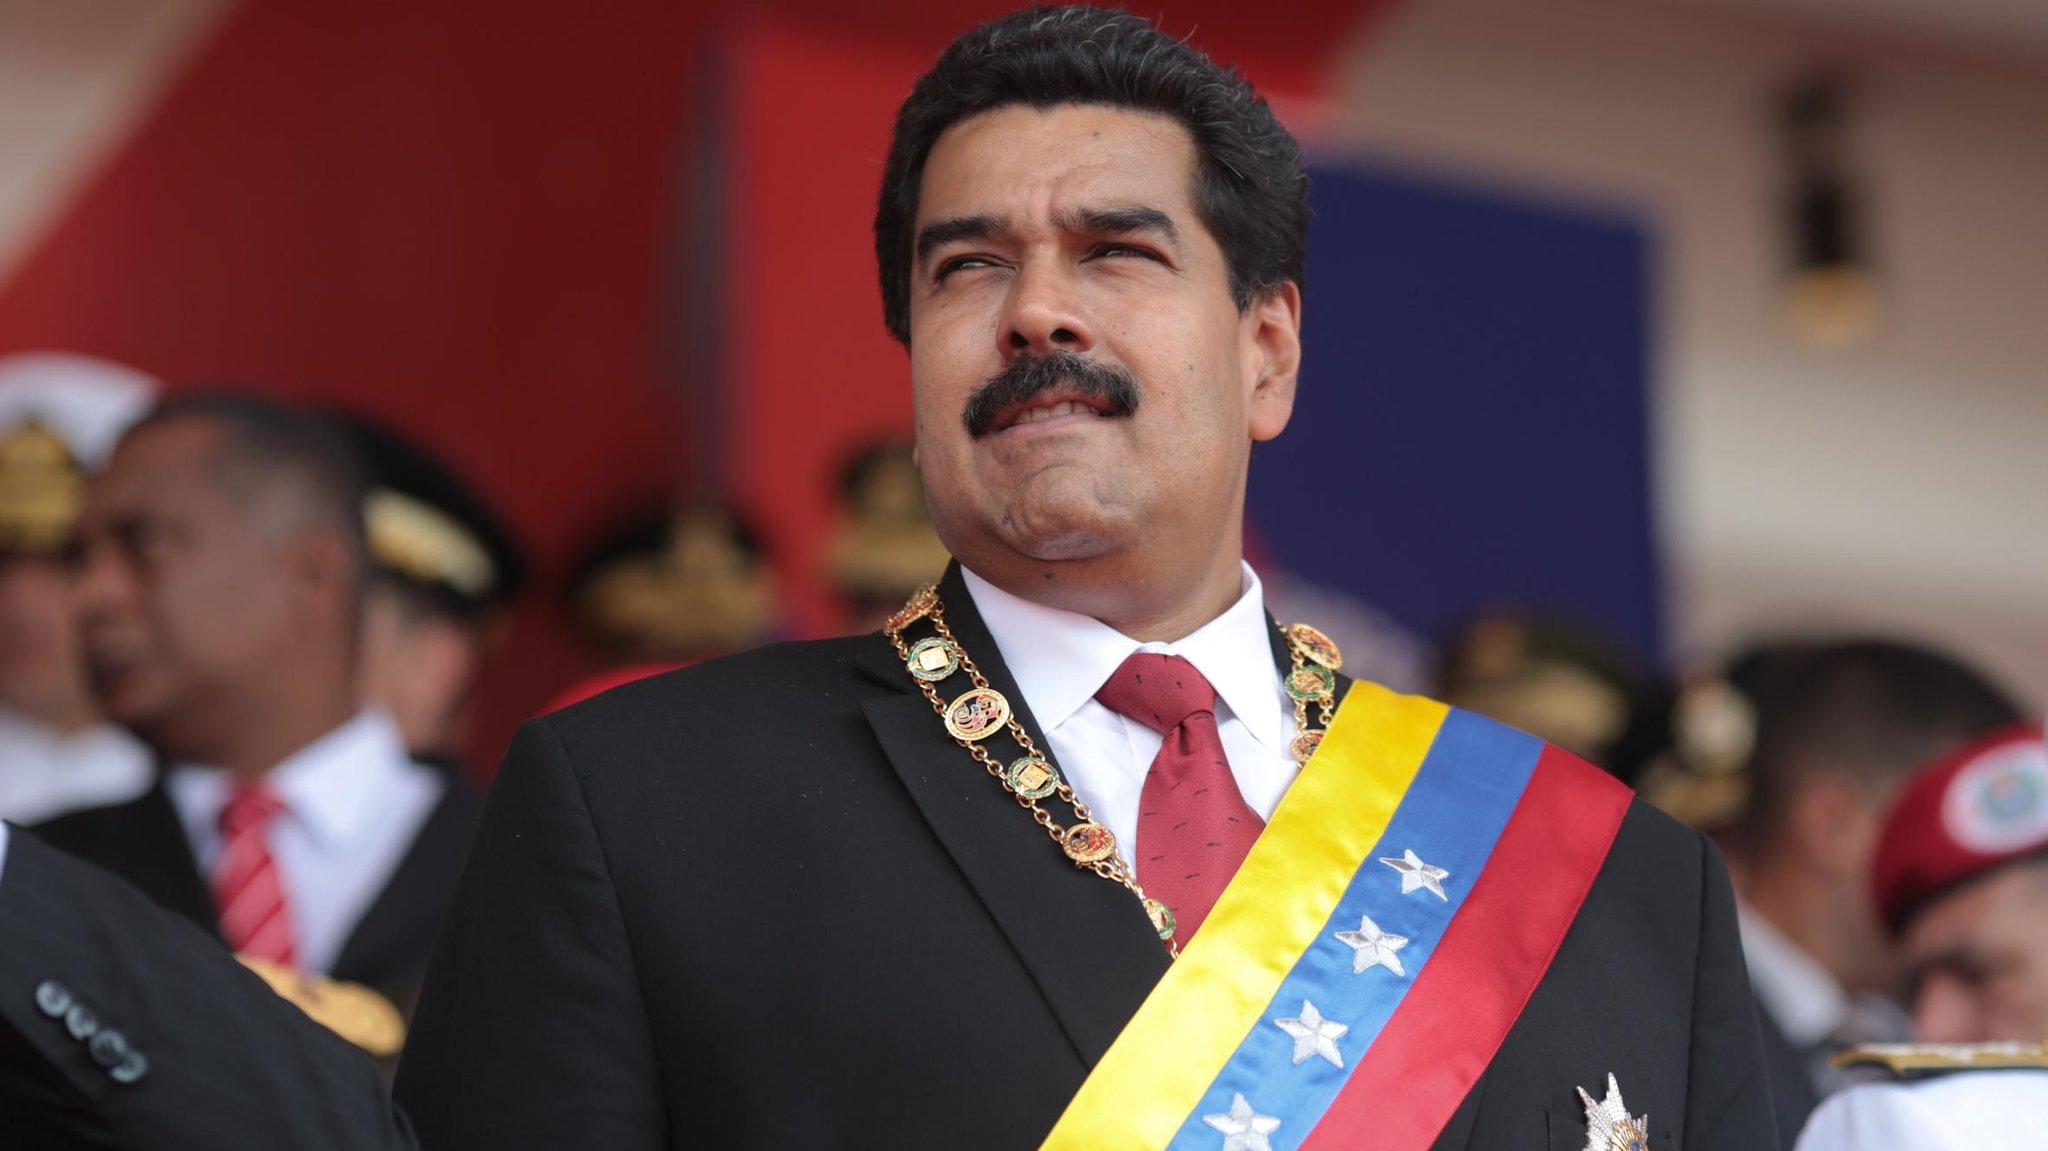 Николас Мадуро президент Венесуэлы (сс)